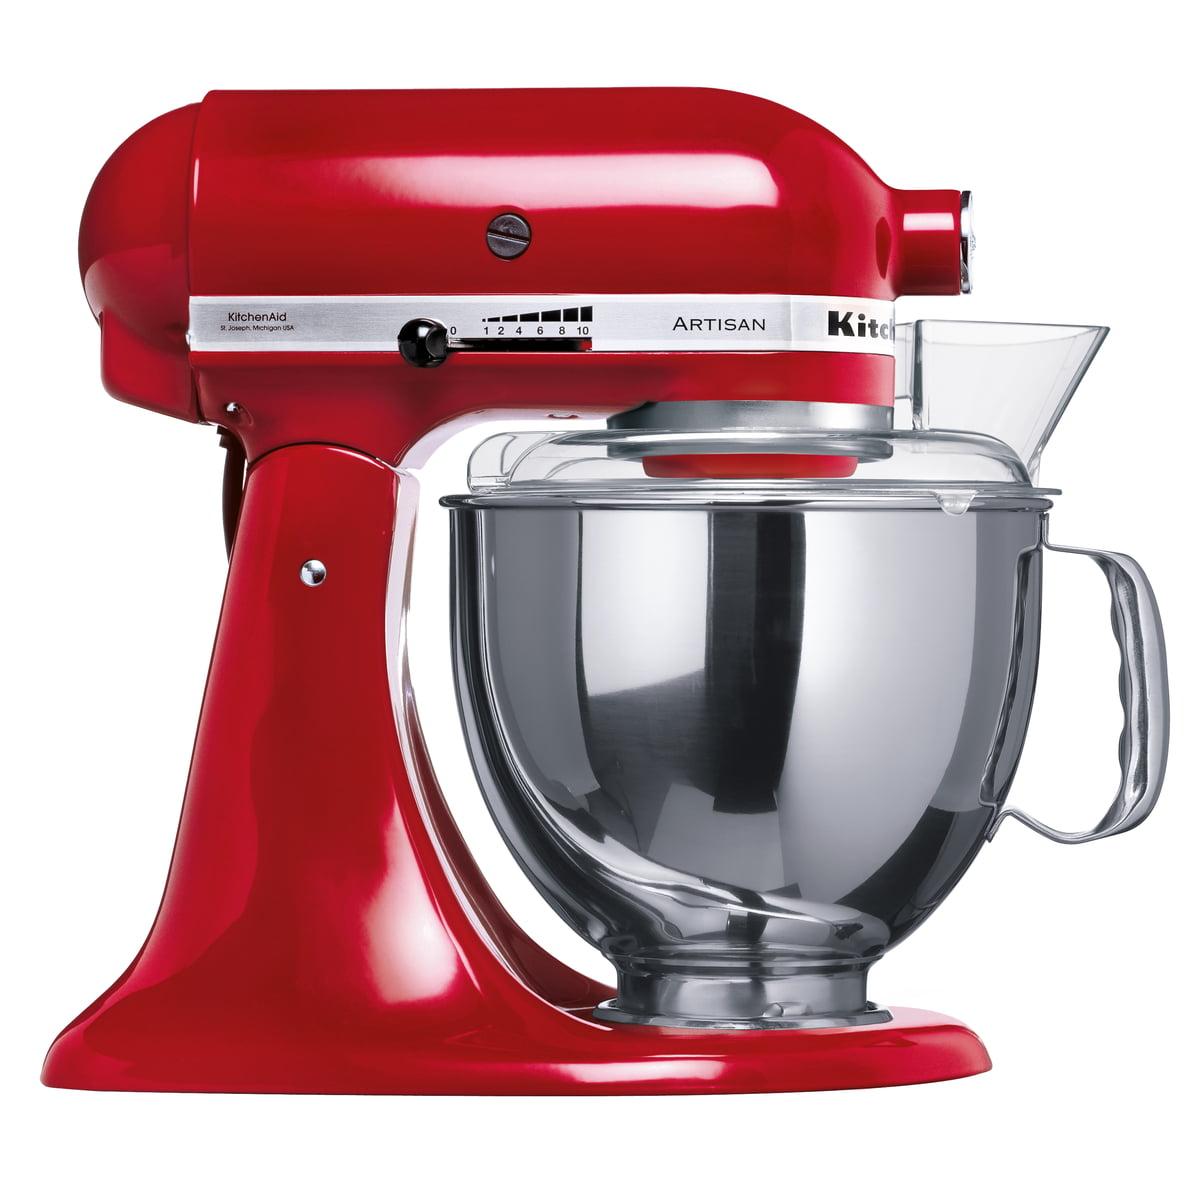 KitchenAid   Artisan Kitchen Appliance